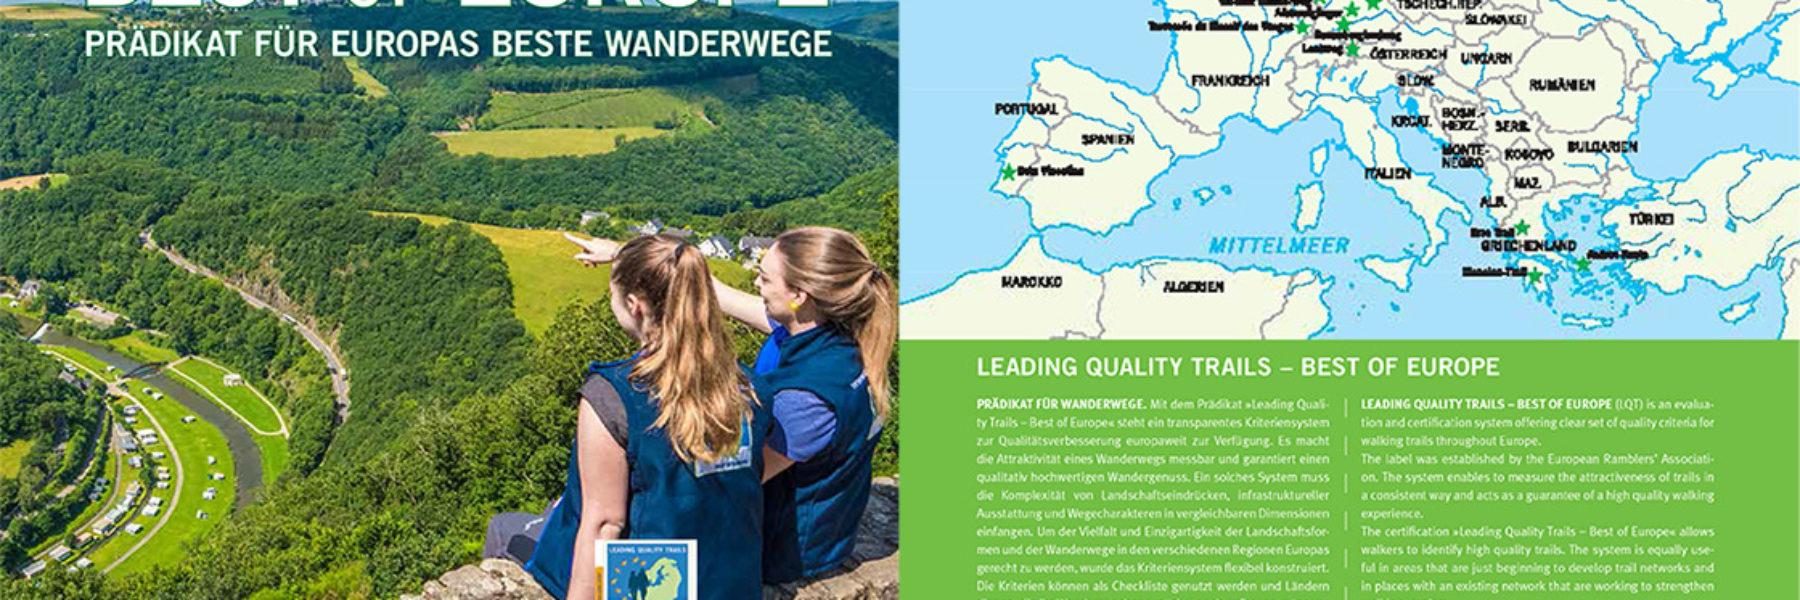 Leading Quality Trails 2019